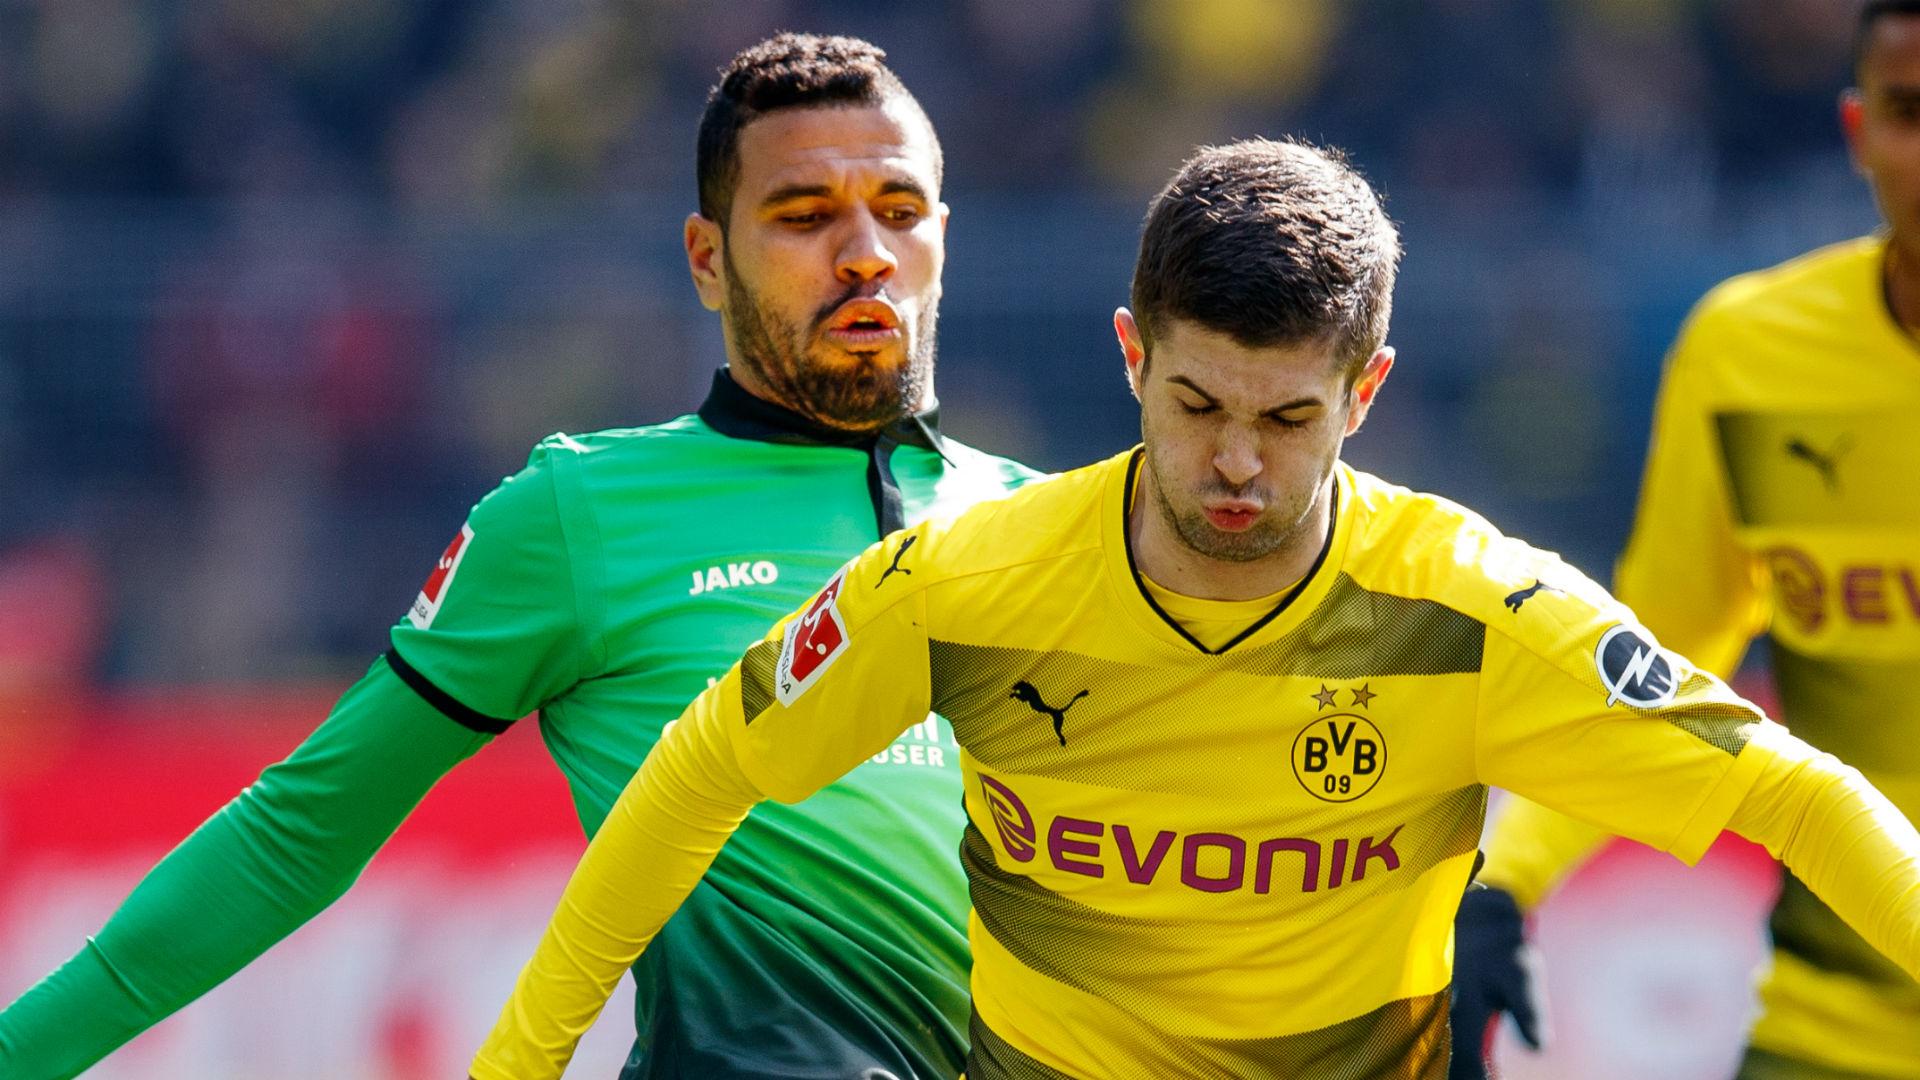 Christian Pulisic Jonathas Borussia Dortmund Hannover